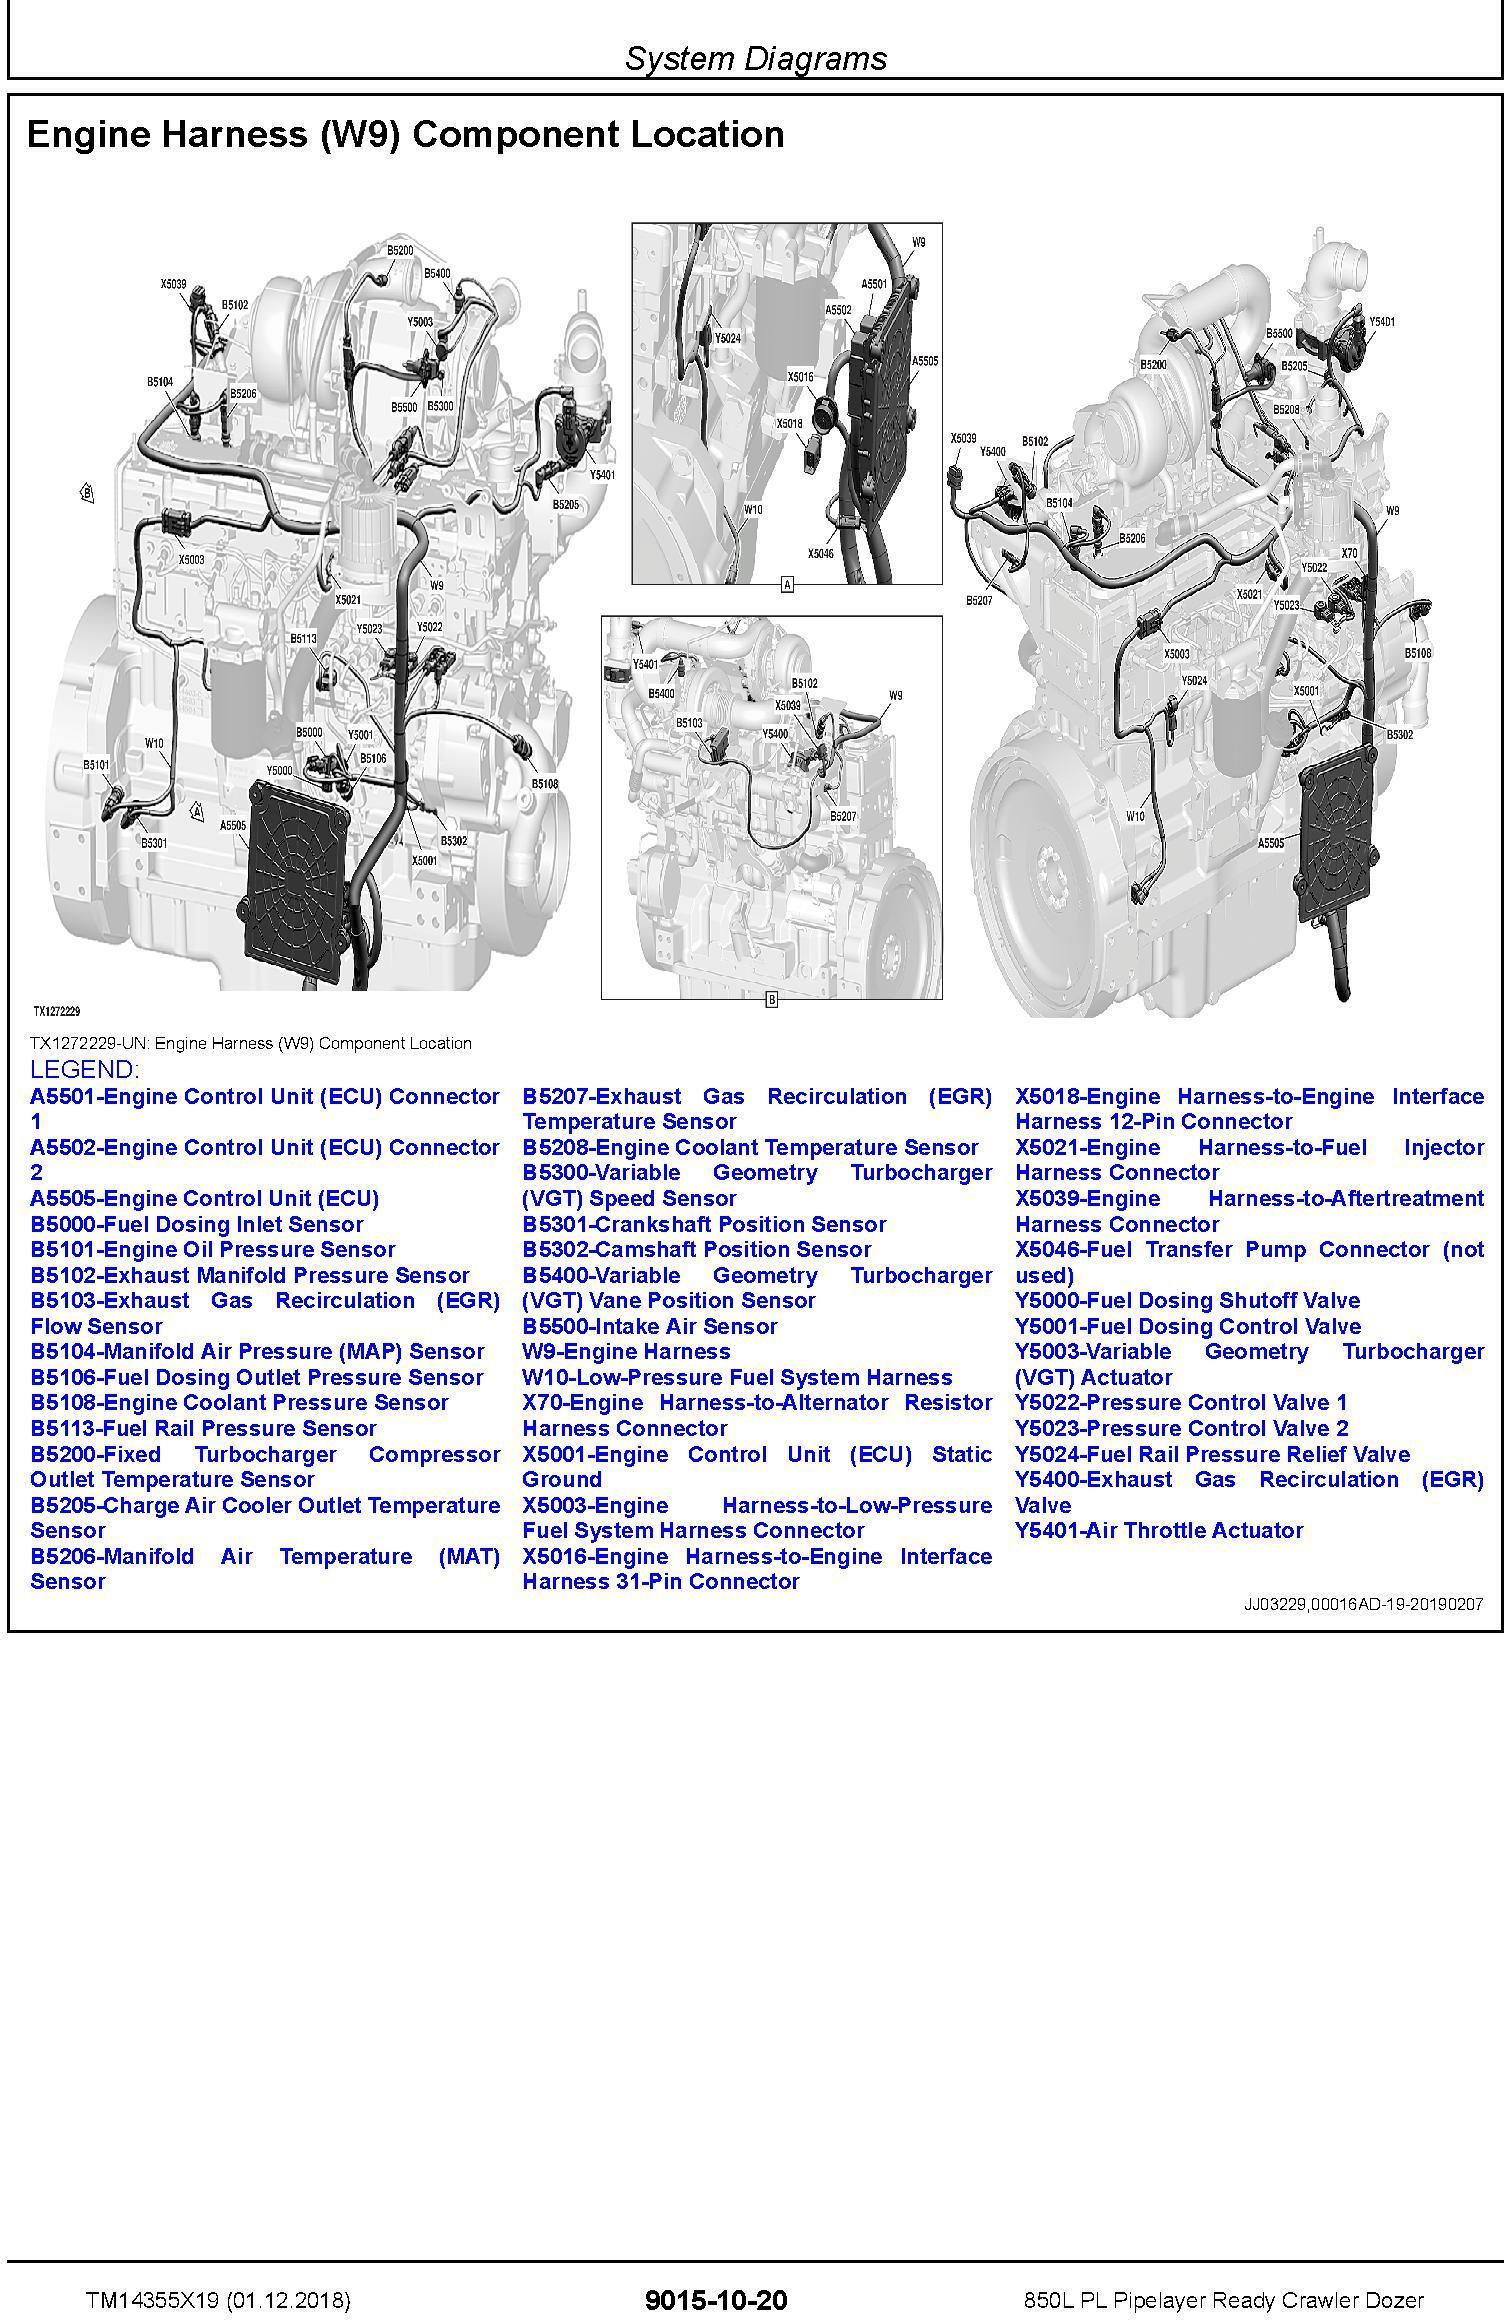 John Deere 850L PL Pipelayer Ready Crawler Dozer Operation & Test Technical Manual (TM14355X19) - 2